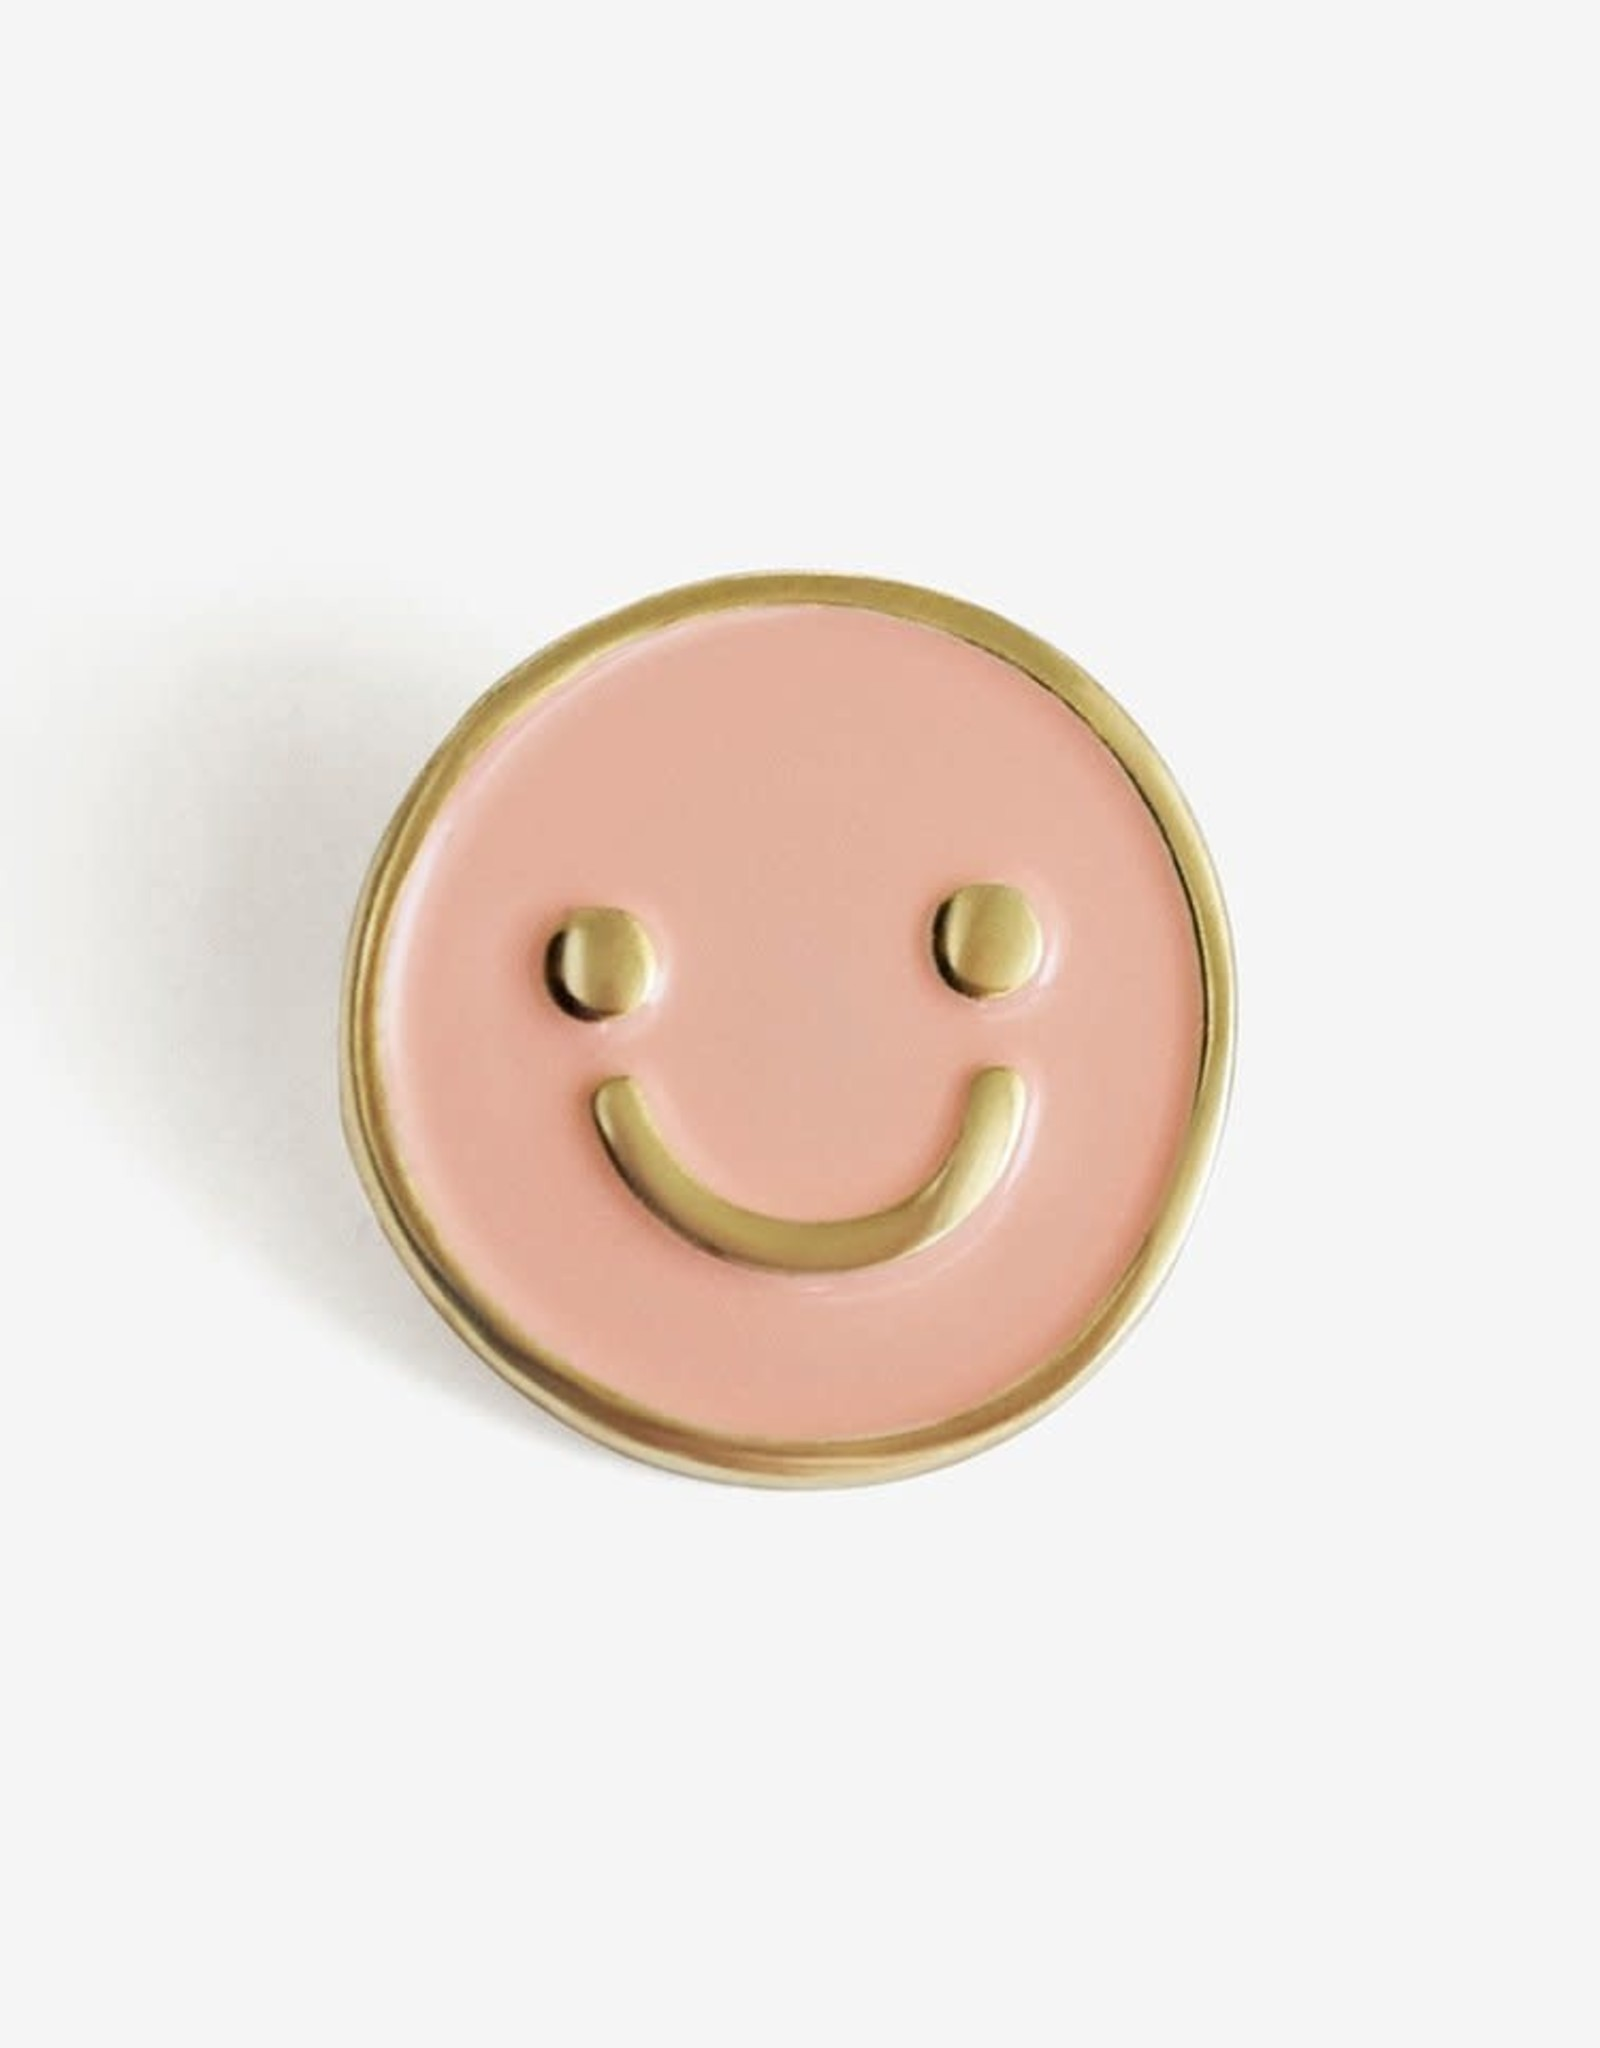 The Good Twin Co. Happy Day Enamel Pin